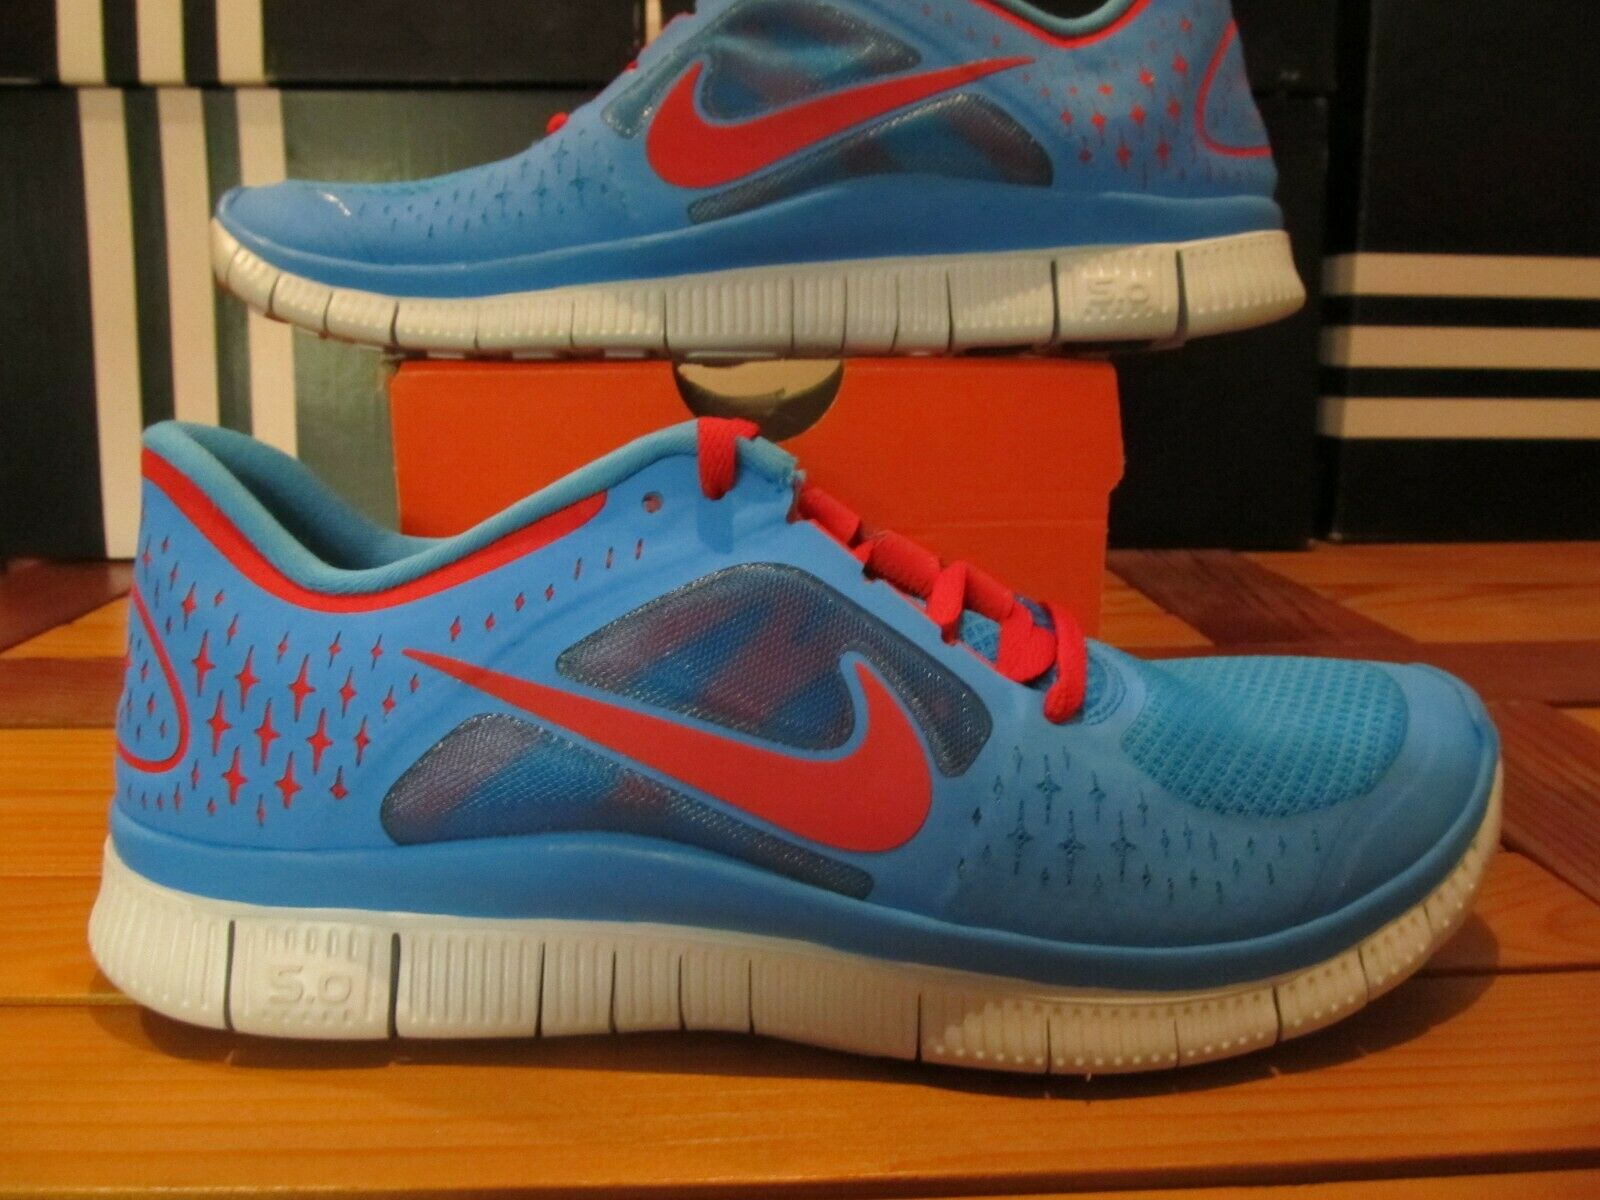 RARE NEW Nike Free Run 3 blu Glow rosso  Platinum 3M 10 510642 403 Walking  rivenditori online